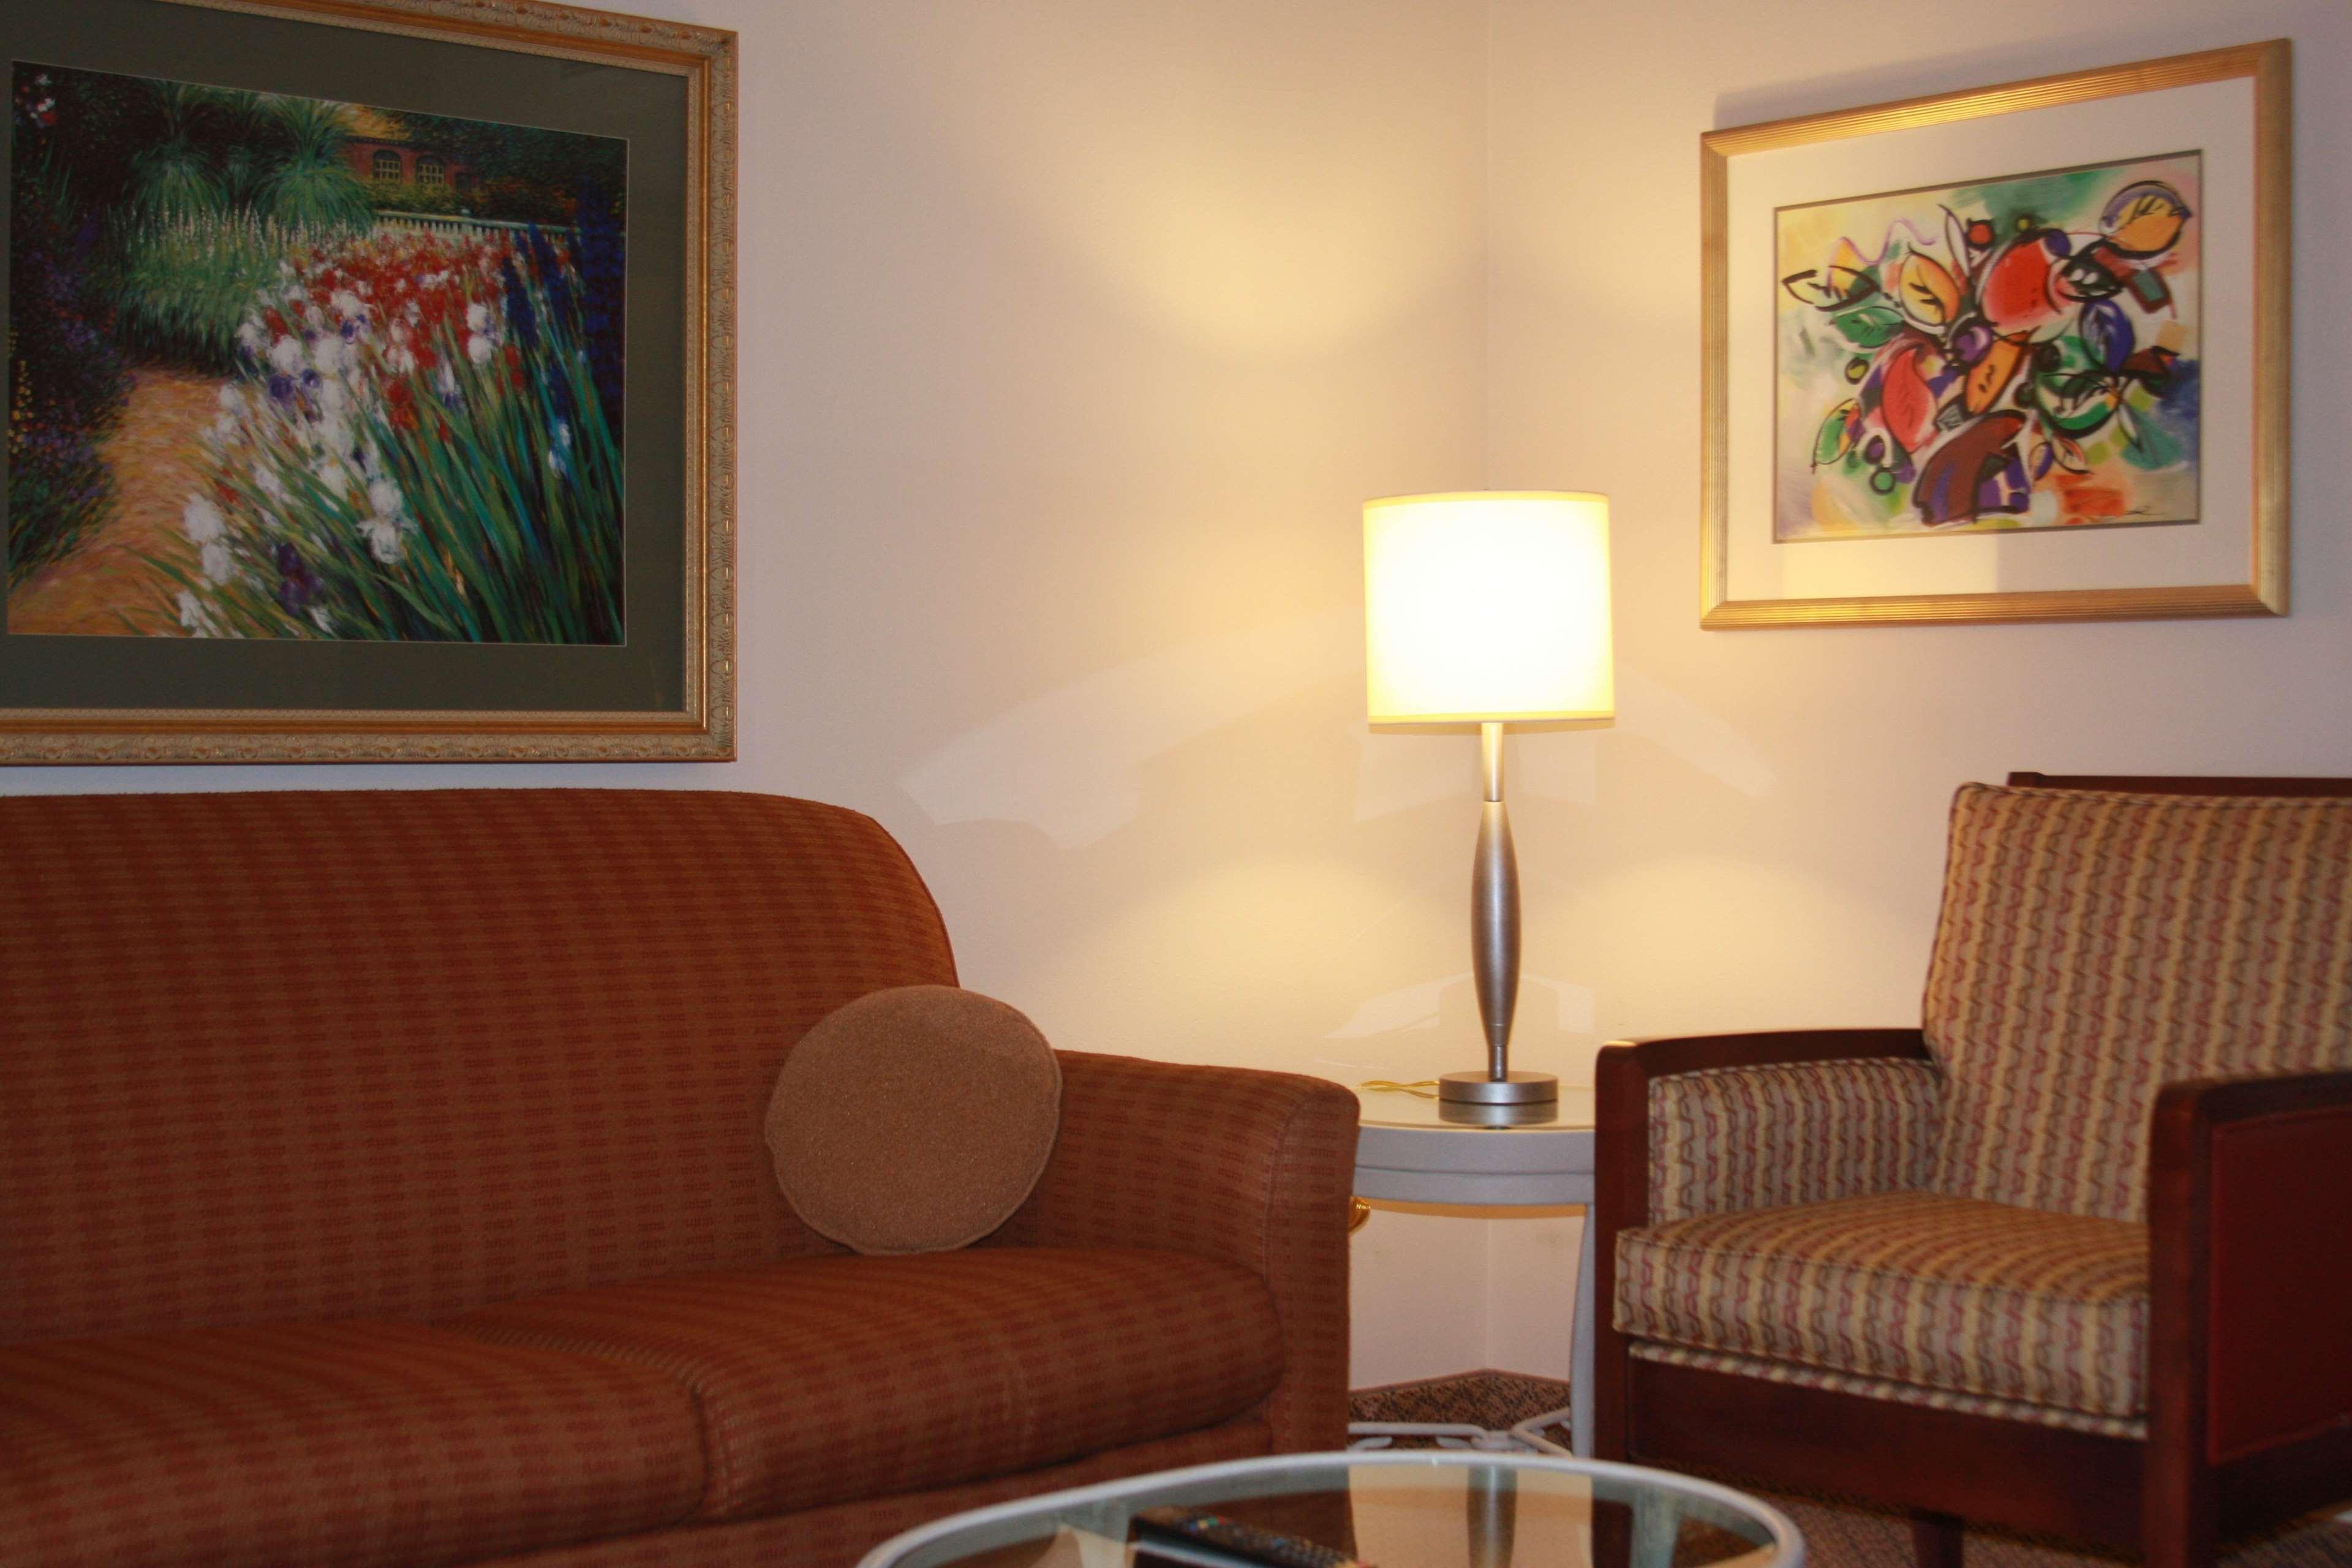 Hilton Garden Inn Elmira/Corning image 21